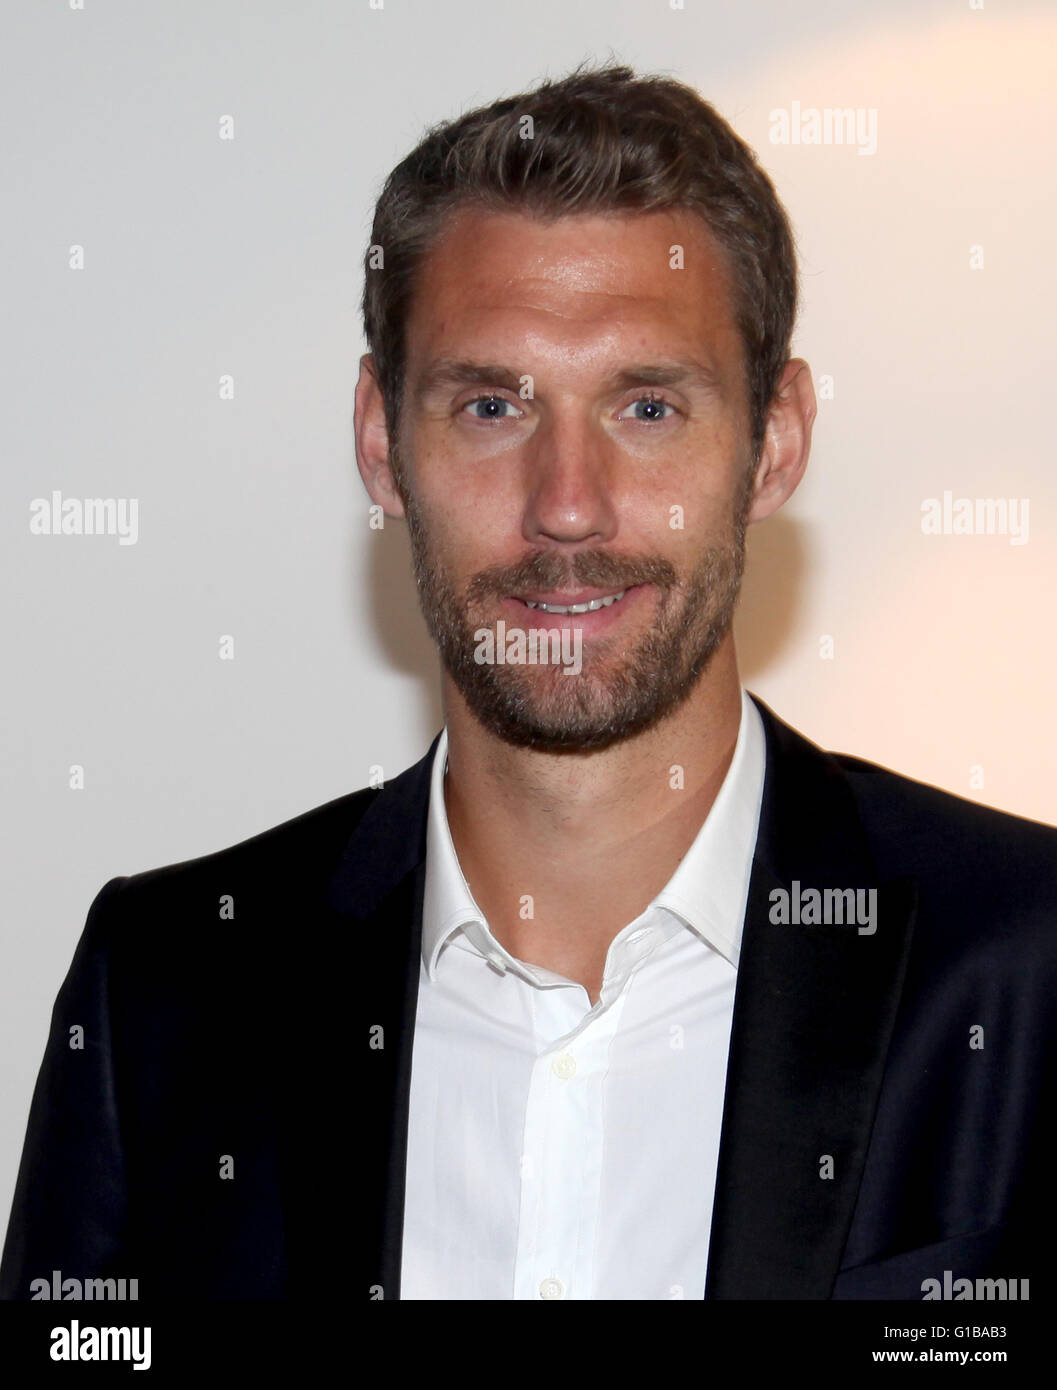 ANDREAS ISAKSSON Swedish professional goalkeeper in Kasimpasa SK Turkey - Stock Image